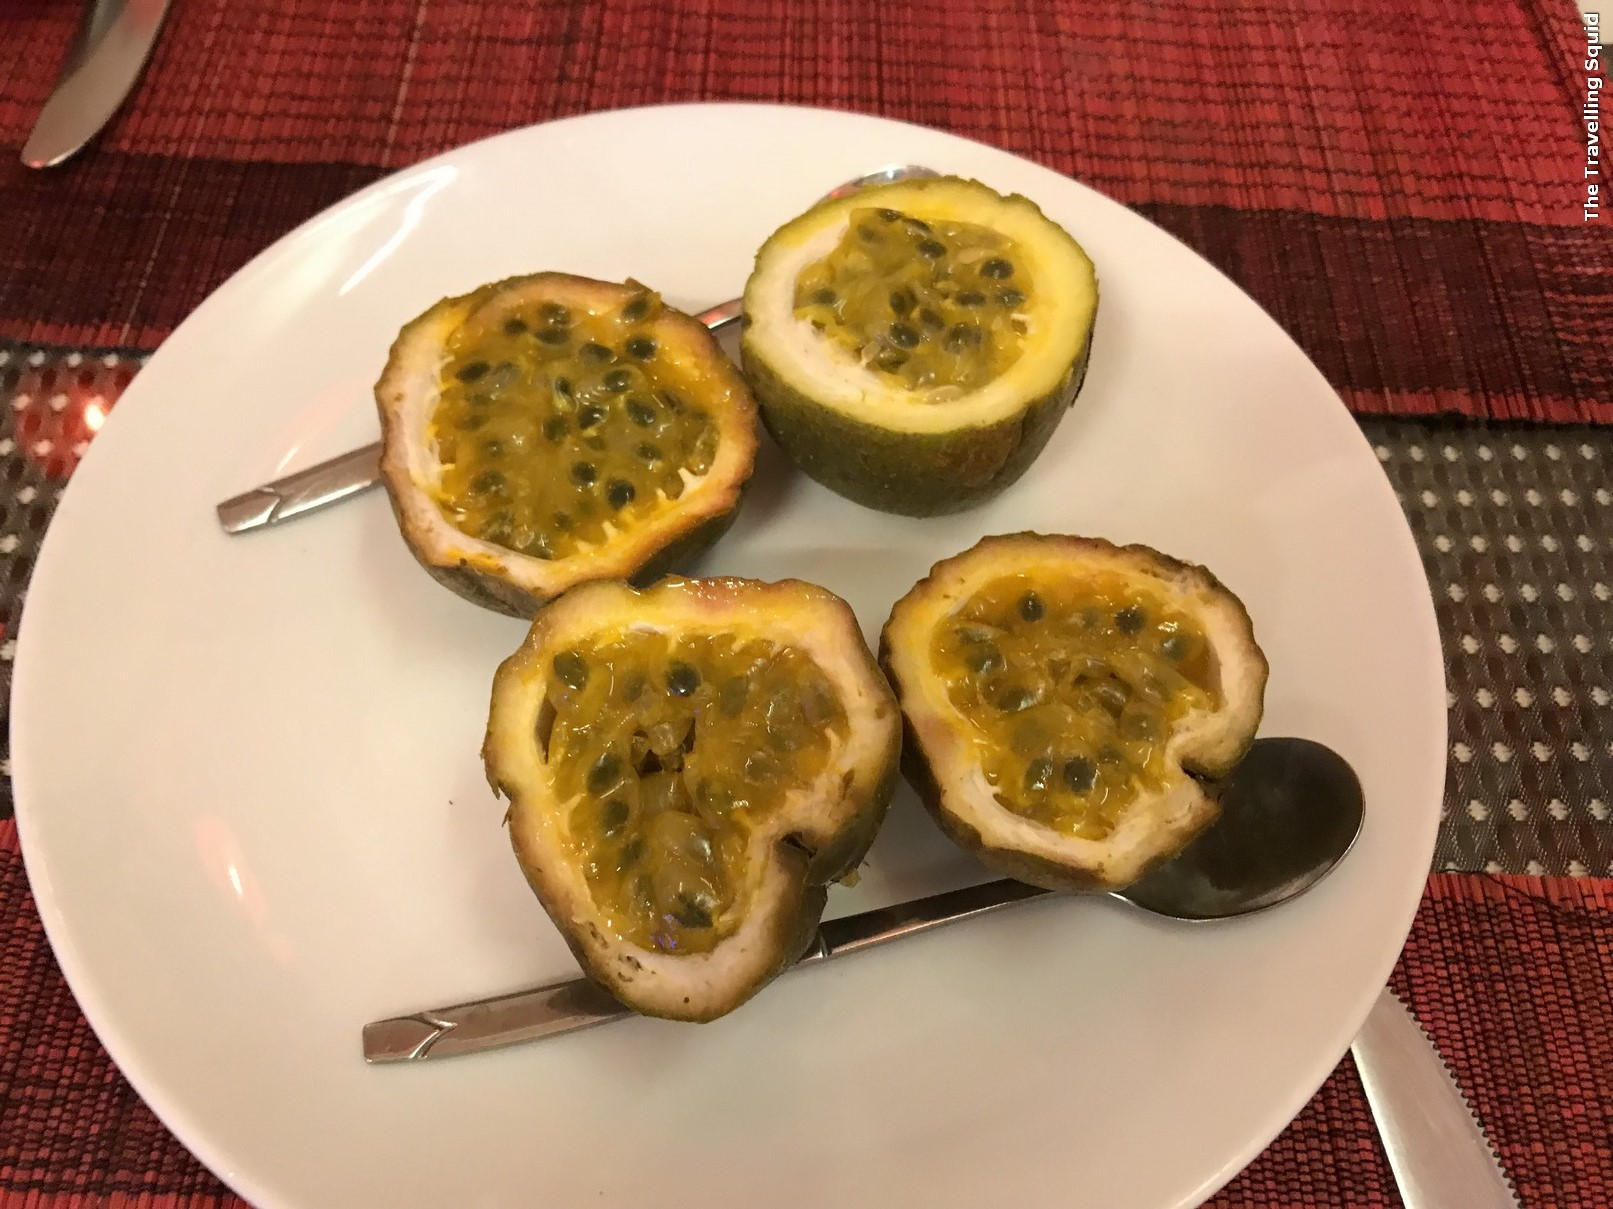 risotto restaurant risotto hue vietnam passionfruit